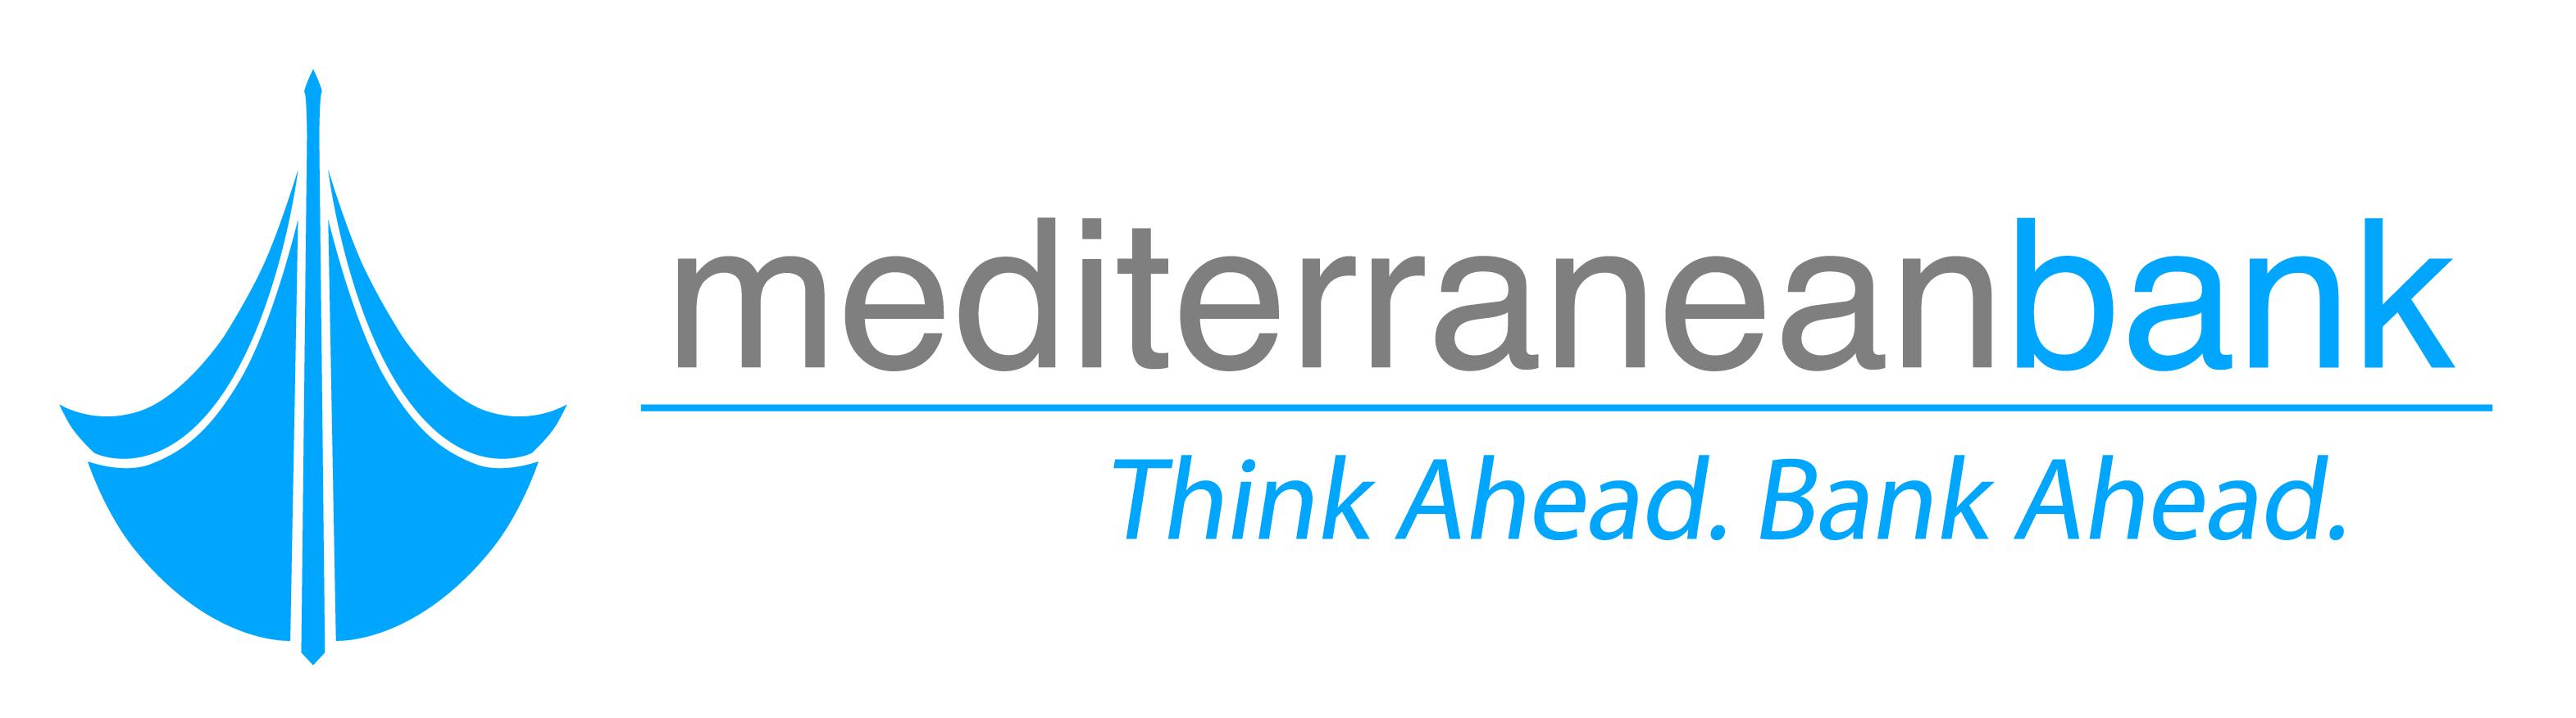 Mediterrranean bank VER logo FLAT